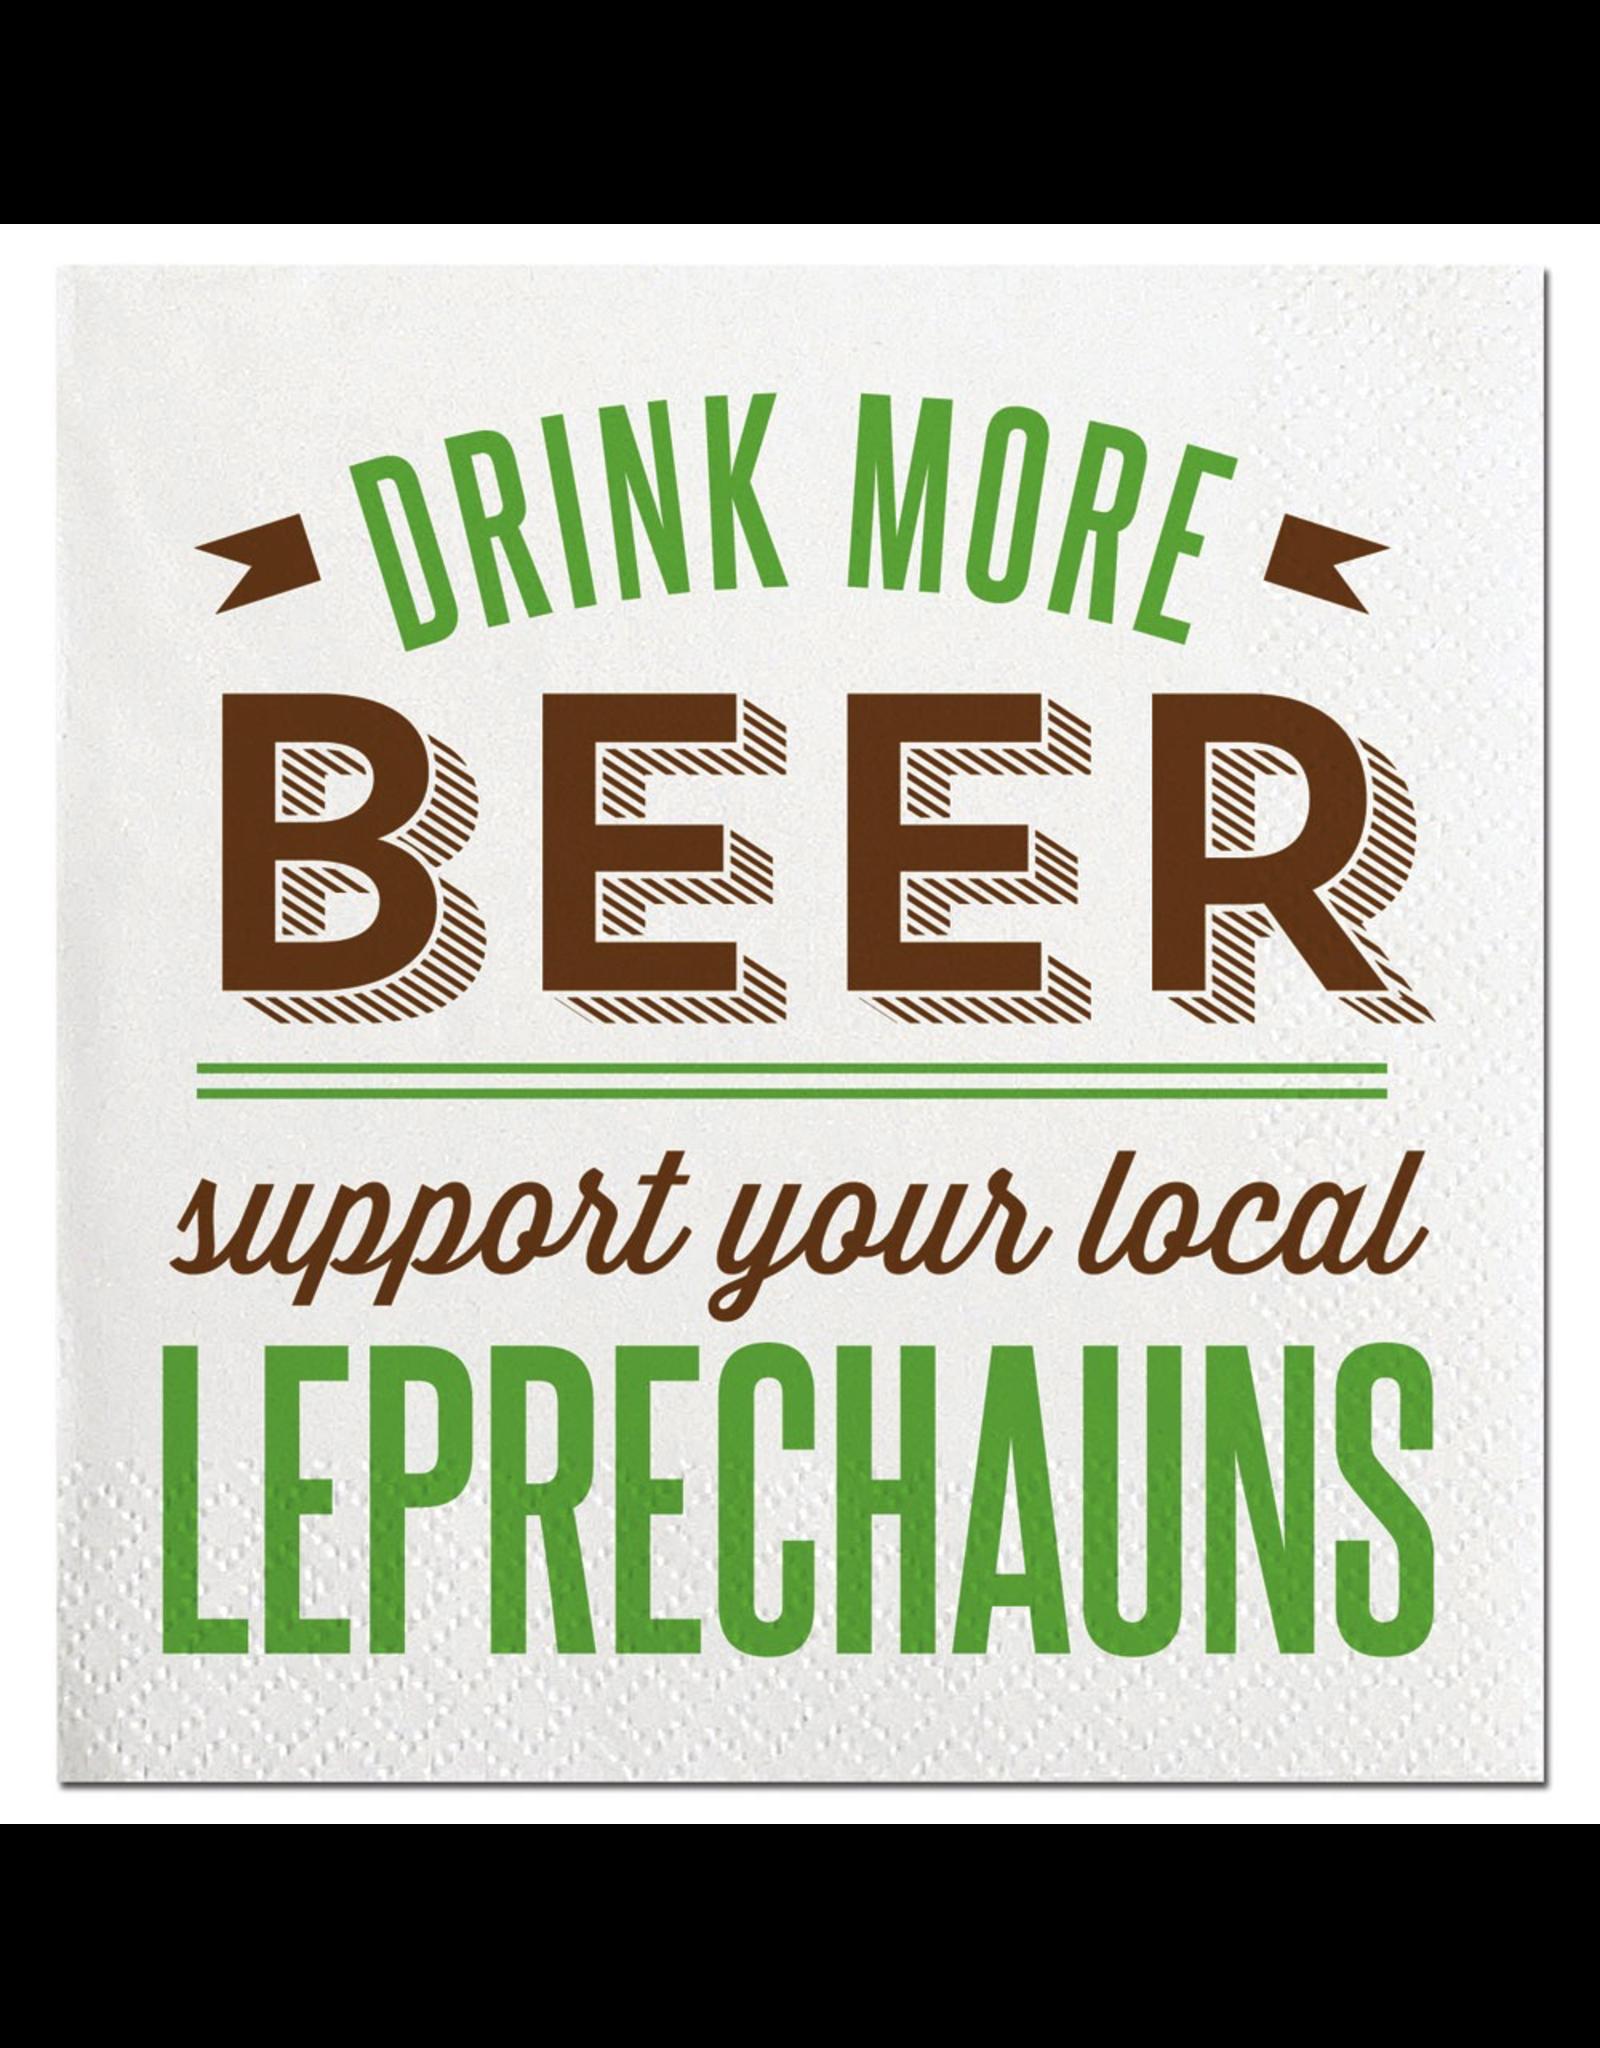 Slant St Patricks Day Cocktail Napkins 20ct Support Local Leprechauns